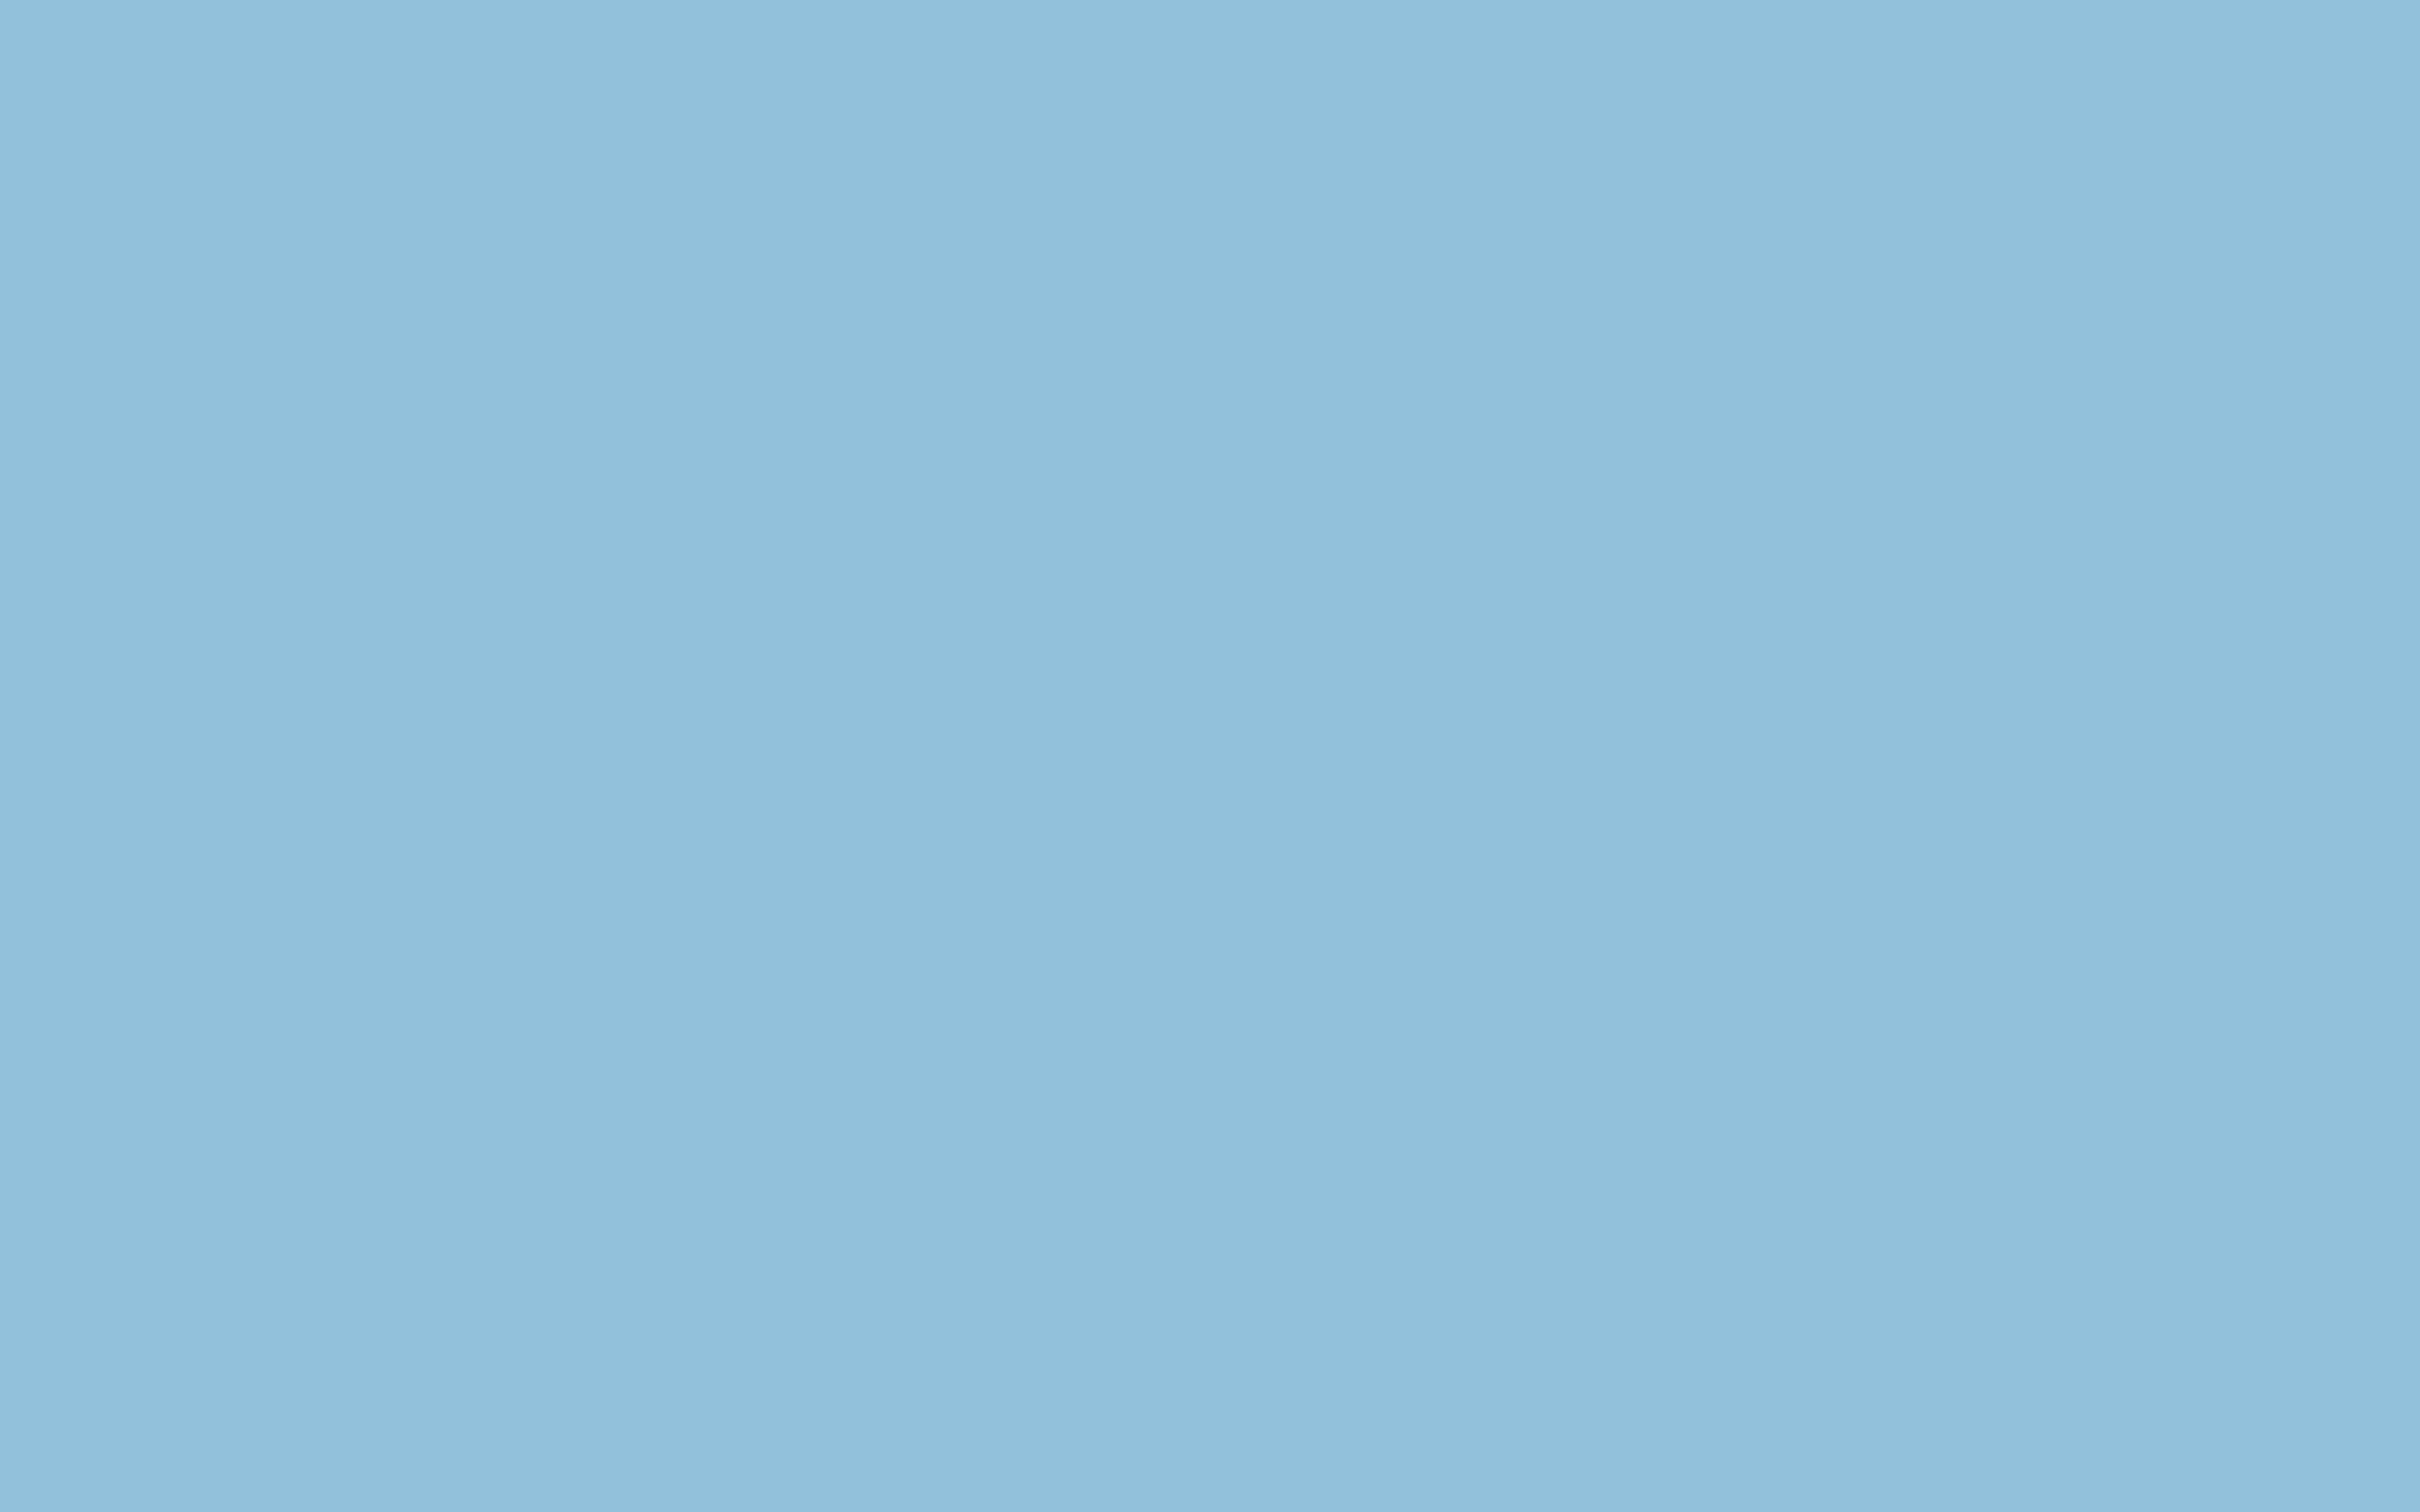 Light Blue Wallpapers – Wallpaper Cave